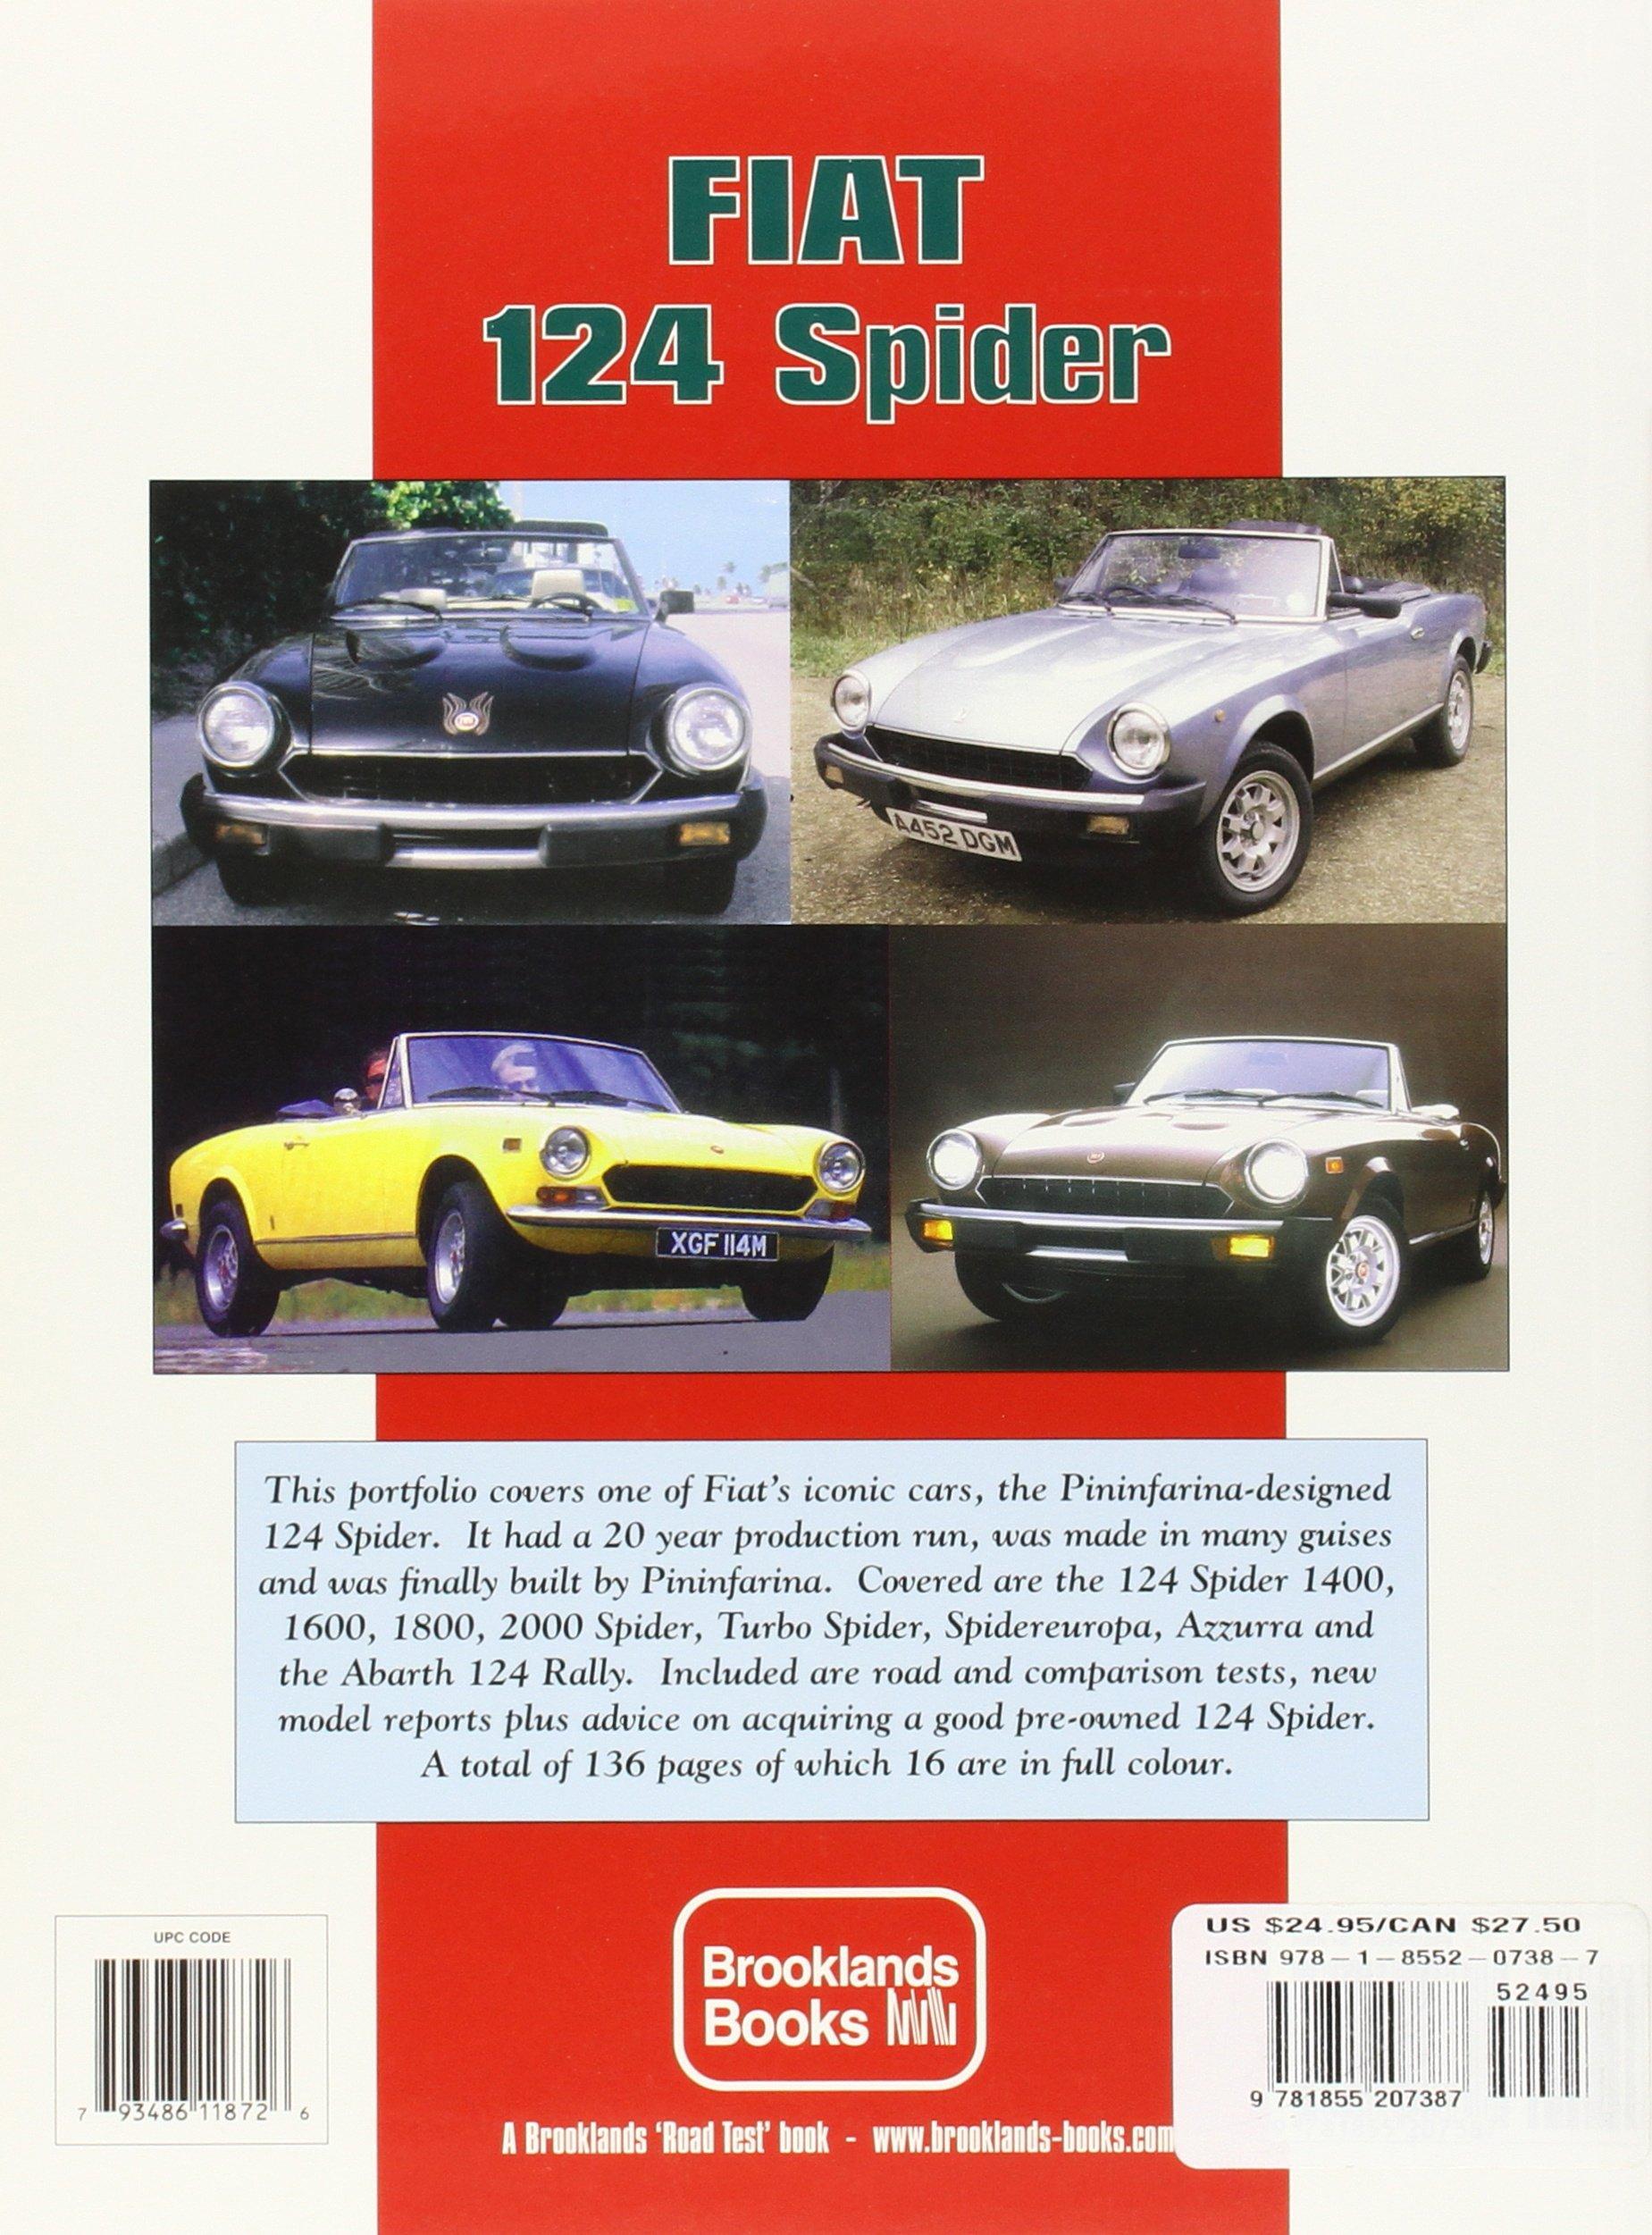 Fiat 124 Spider Performance Portfolio 1966-1985: Amazon.es: R. M. Clarke: Libros en idiomas extranjeros